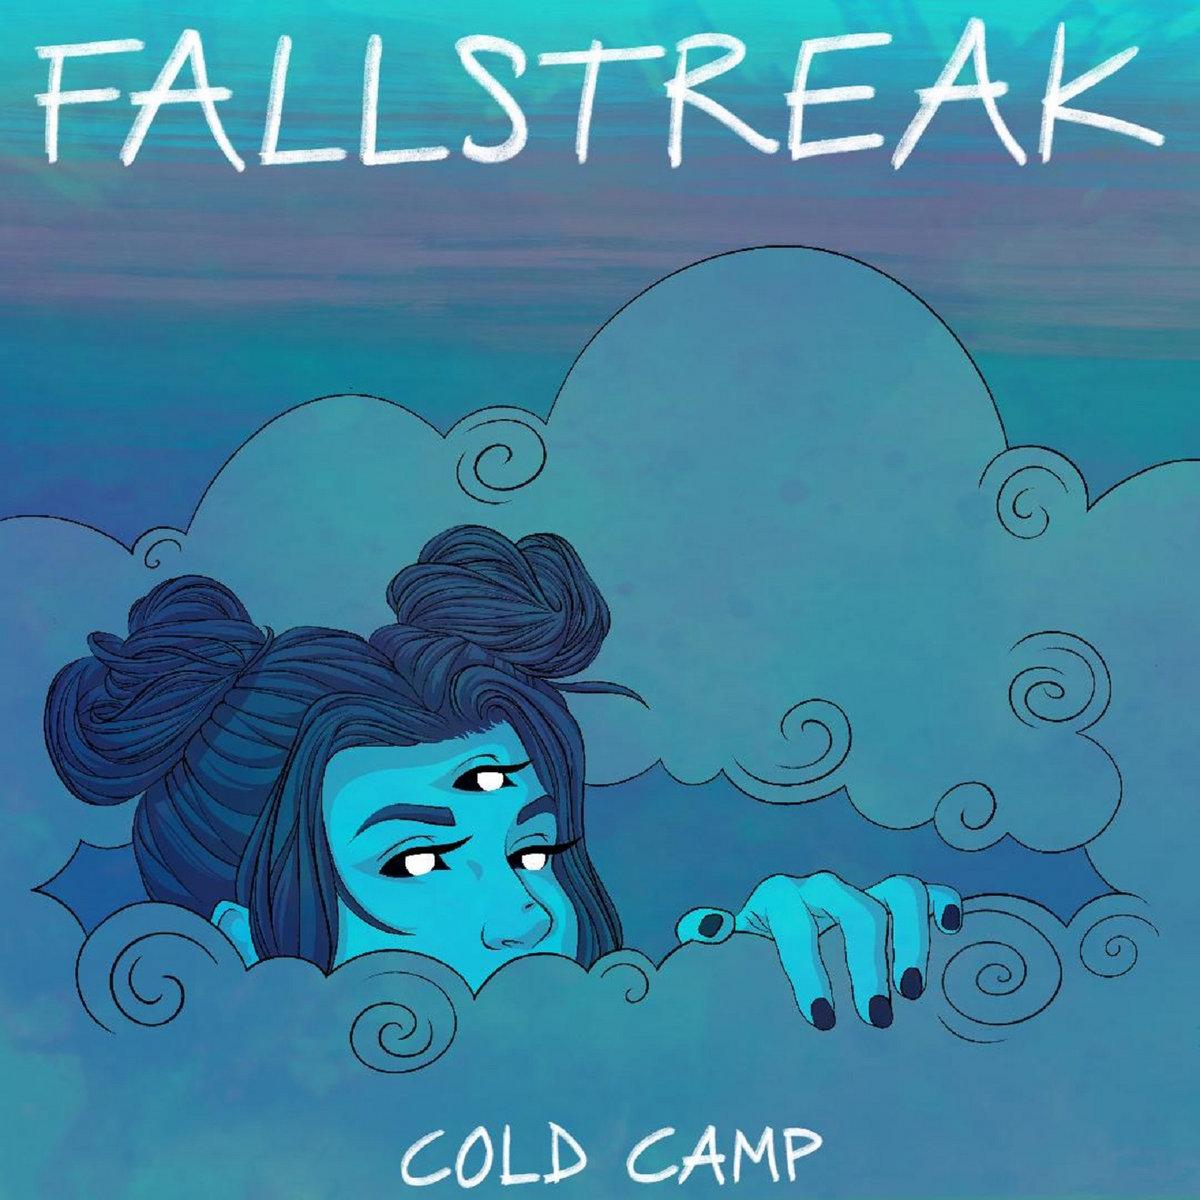 https://coldcamp.bandcamp.com/album/fallstreak